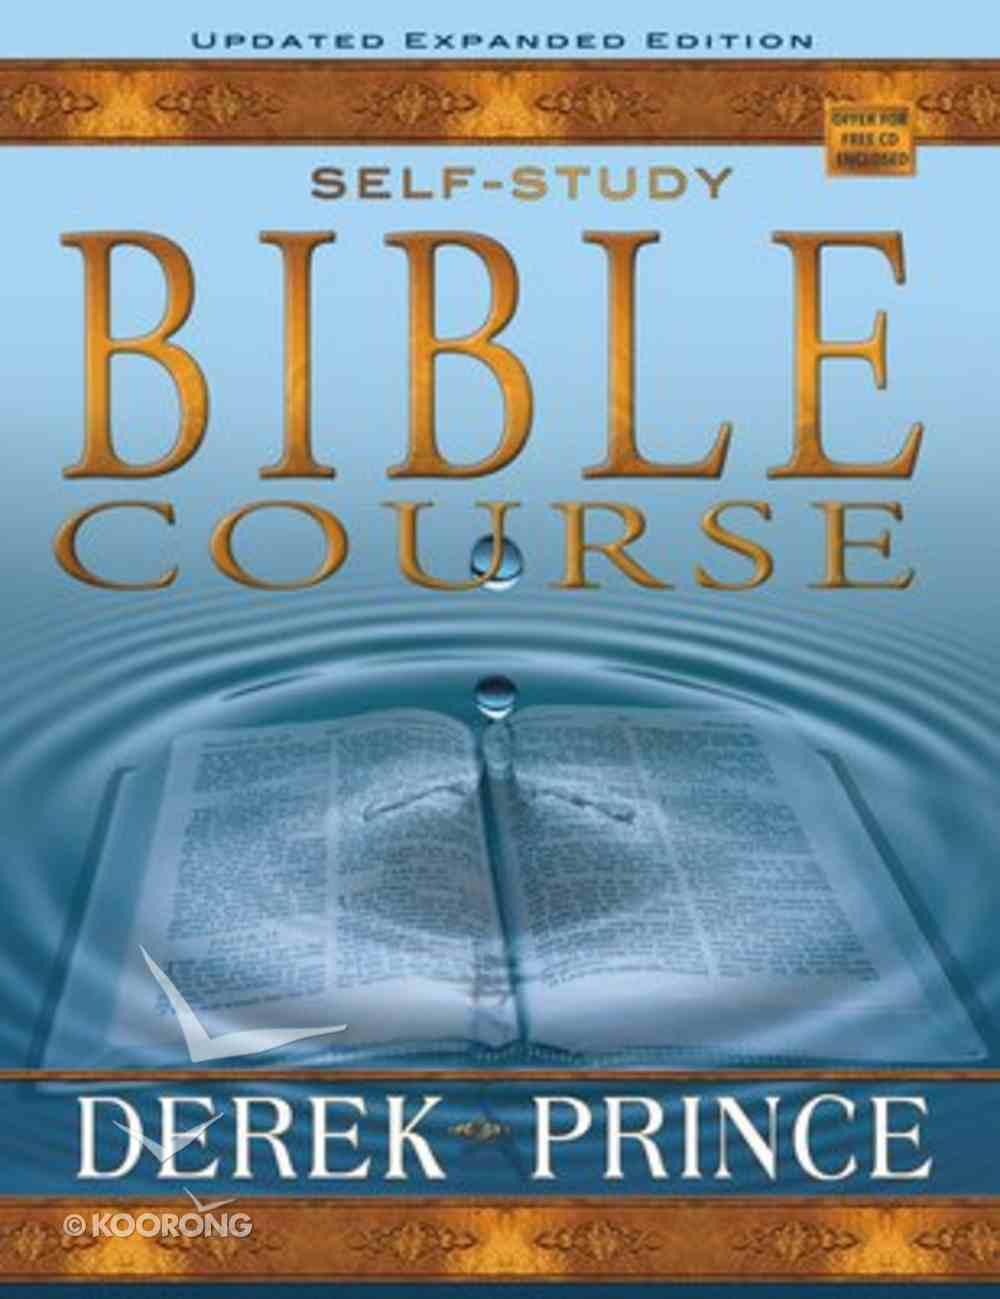 Self-Study Bible Course (2005) Paperback